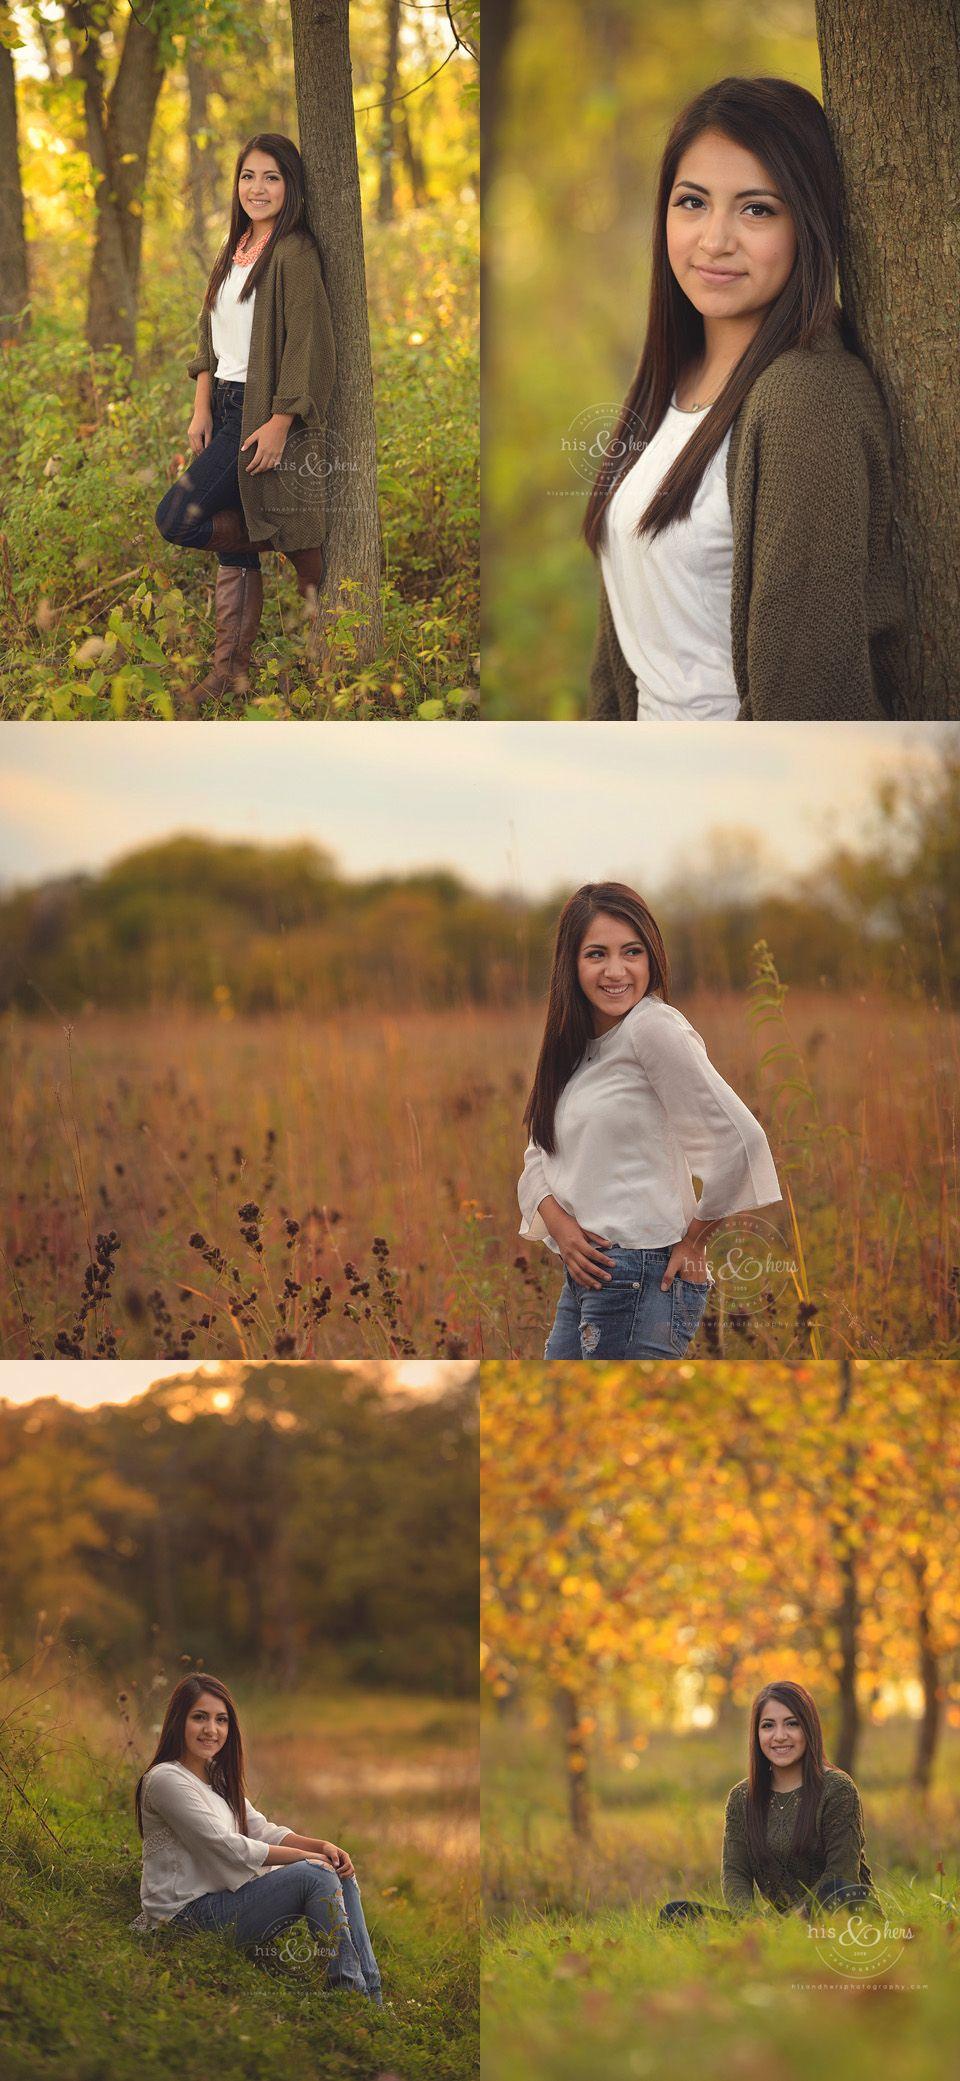 Senior | Dania, class of 2015